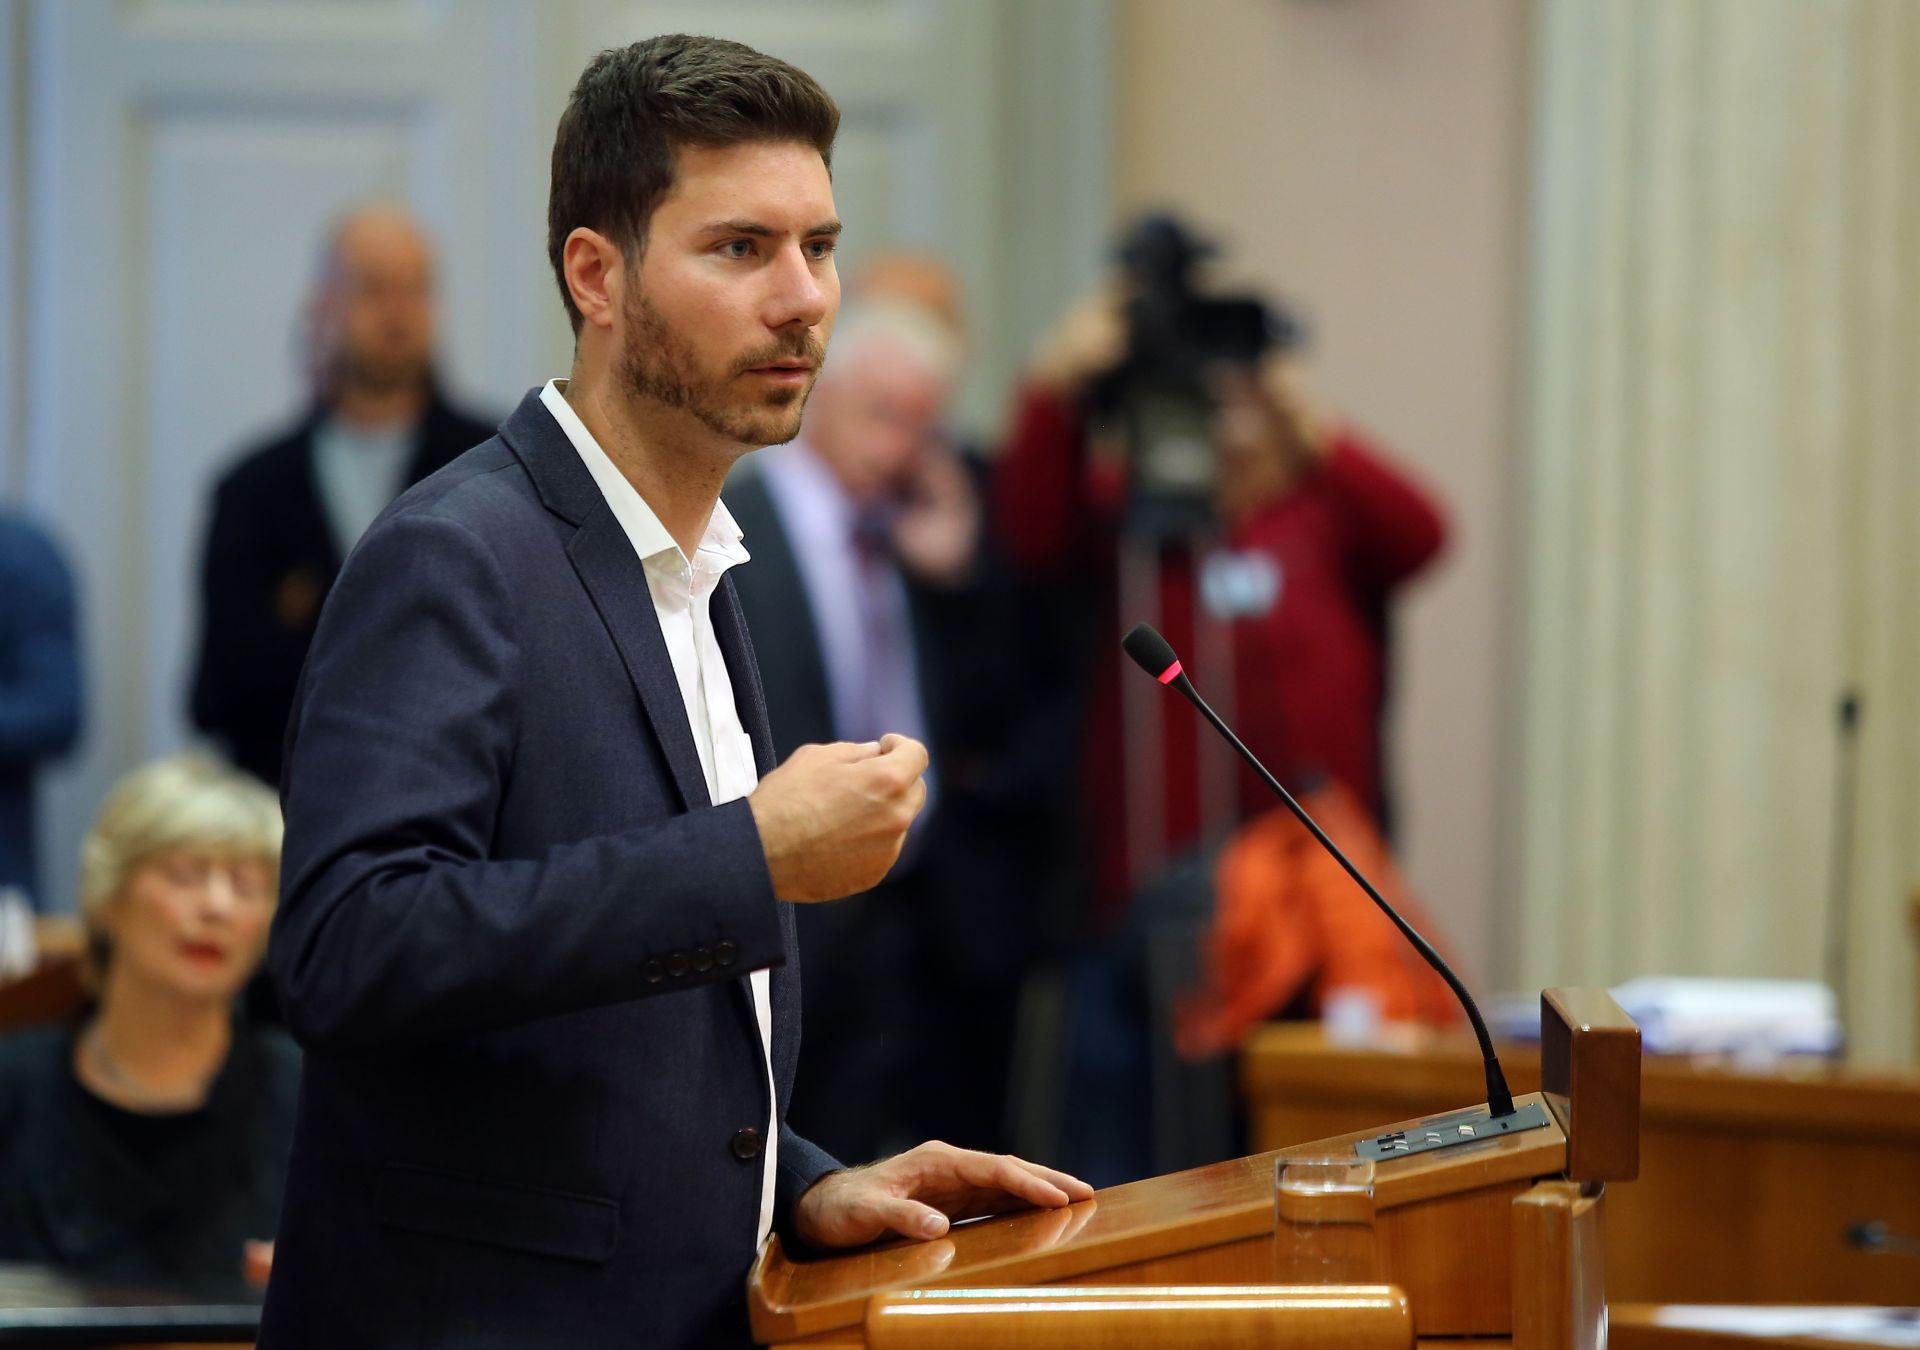 PERNAR 'Ministar financija Zdravko Marić trebao bi odstupiti'